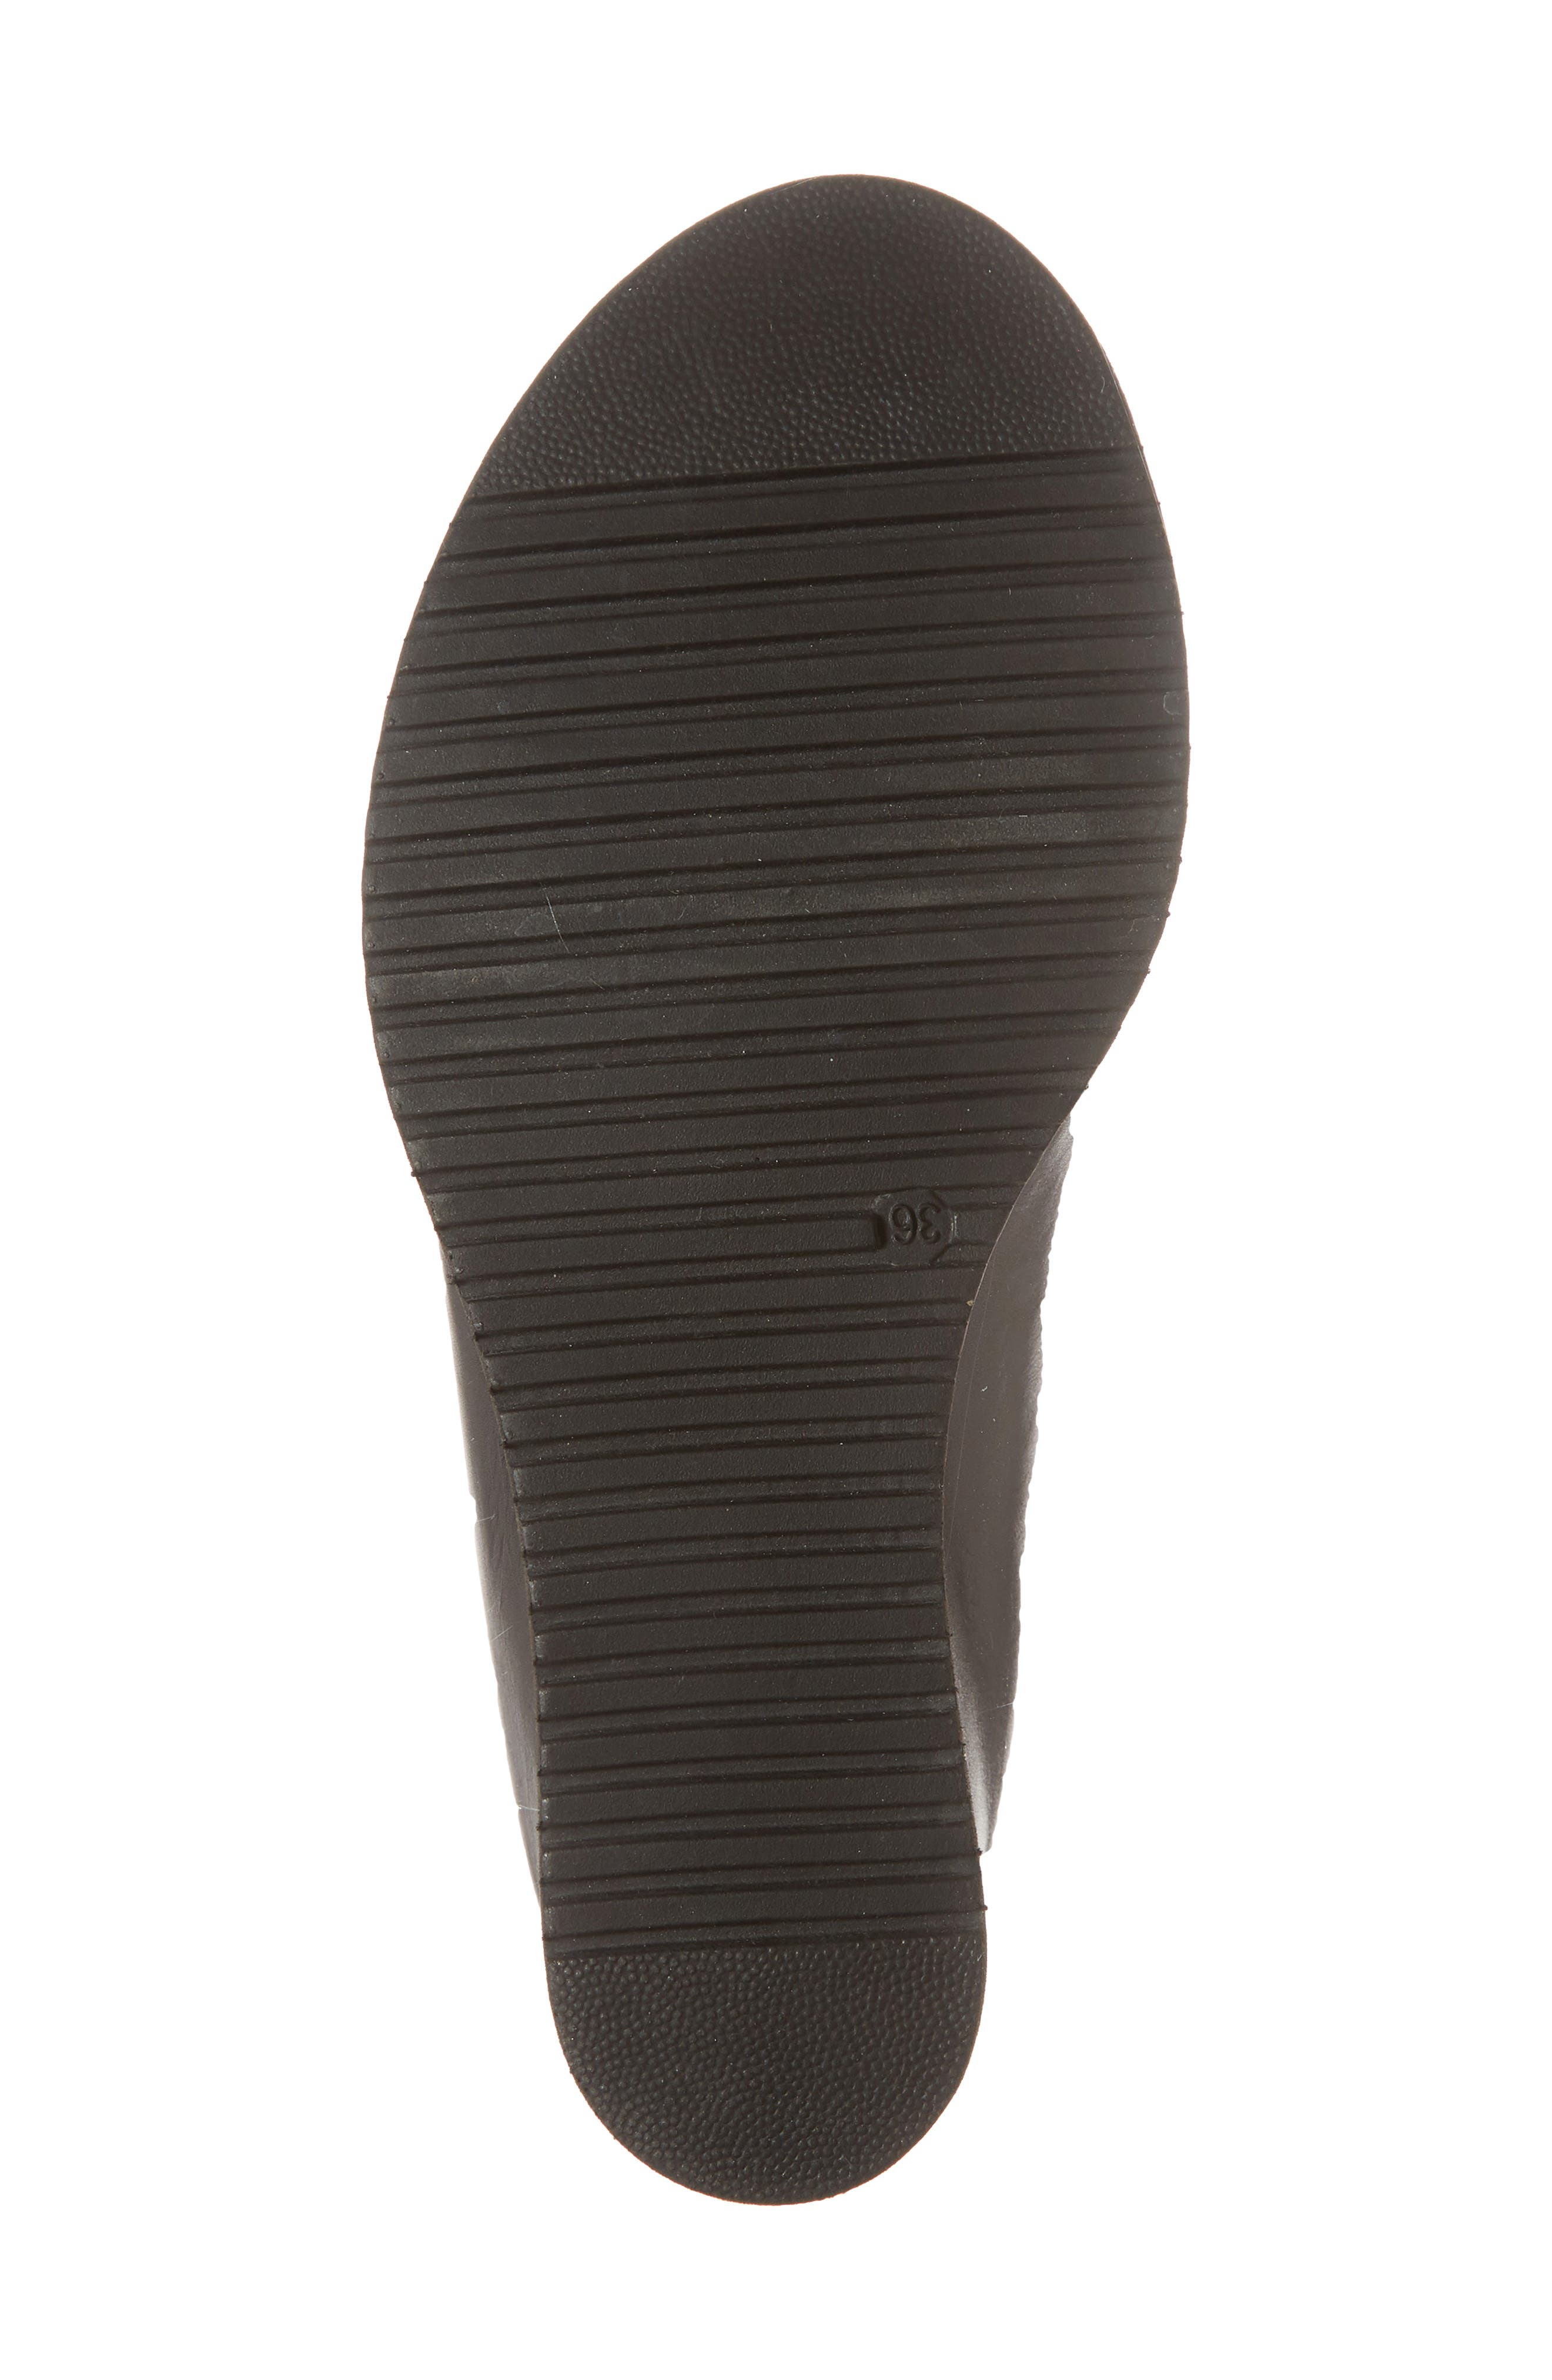 Alis Wedge Sandal,                             Alternate thumbnail 6, color,                             Black/ Black Leather